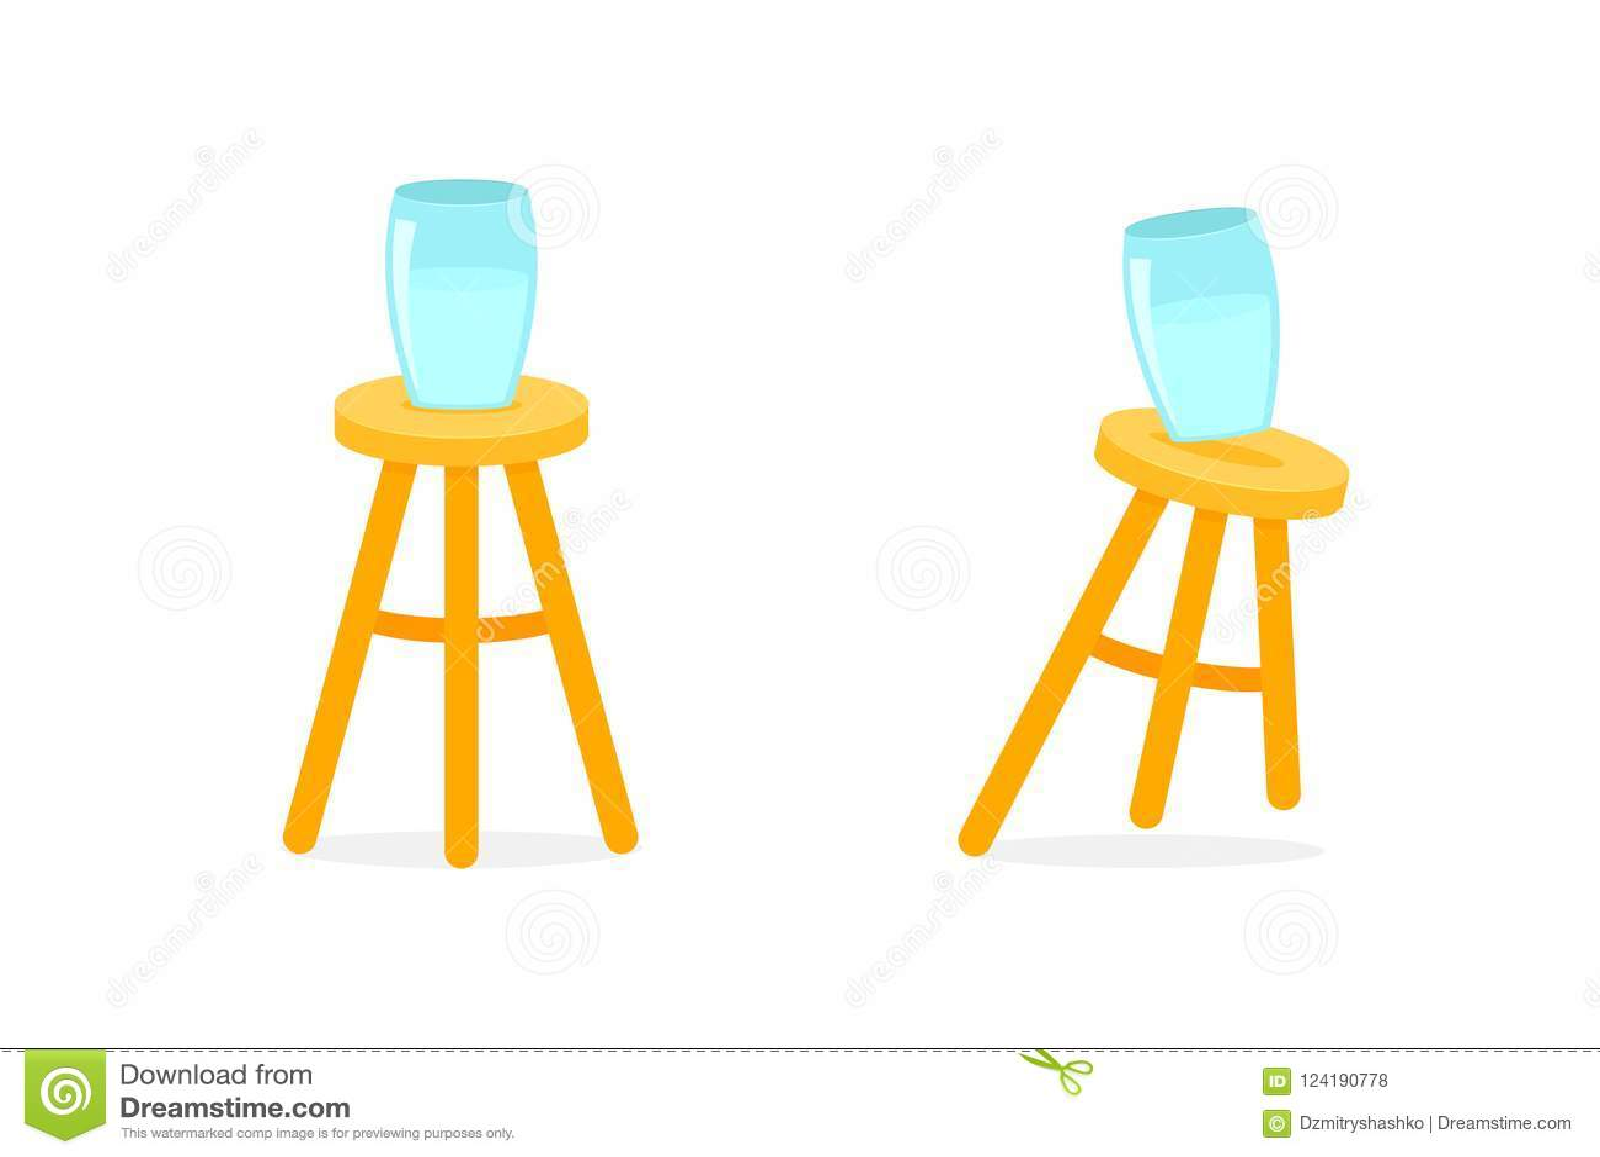 balanced-unbalanced-three-legged-stool-b